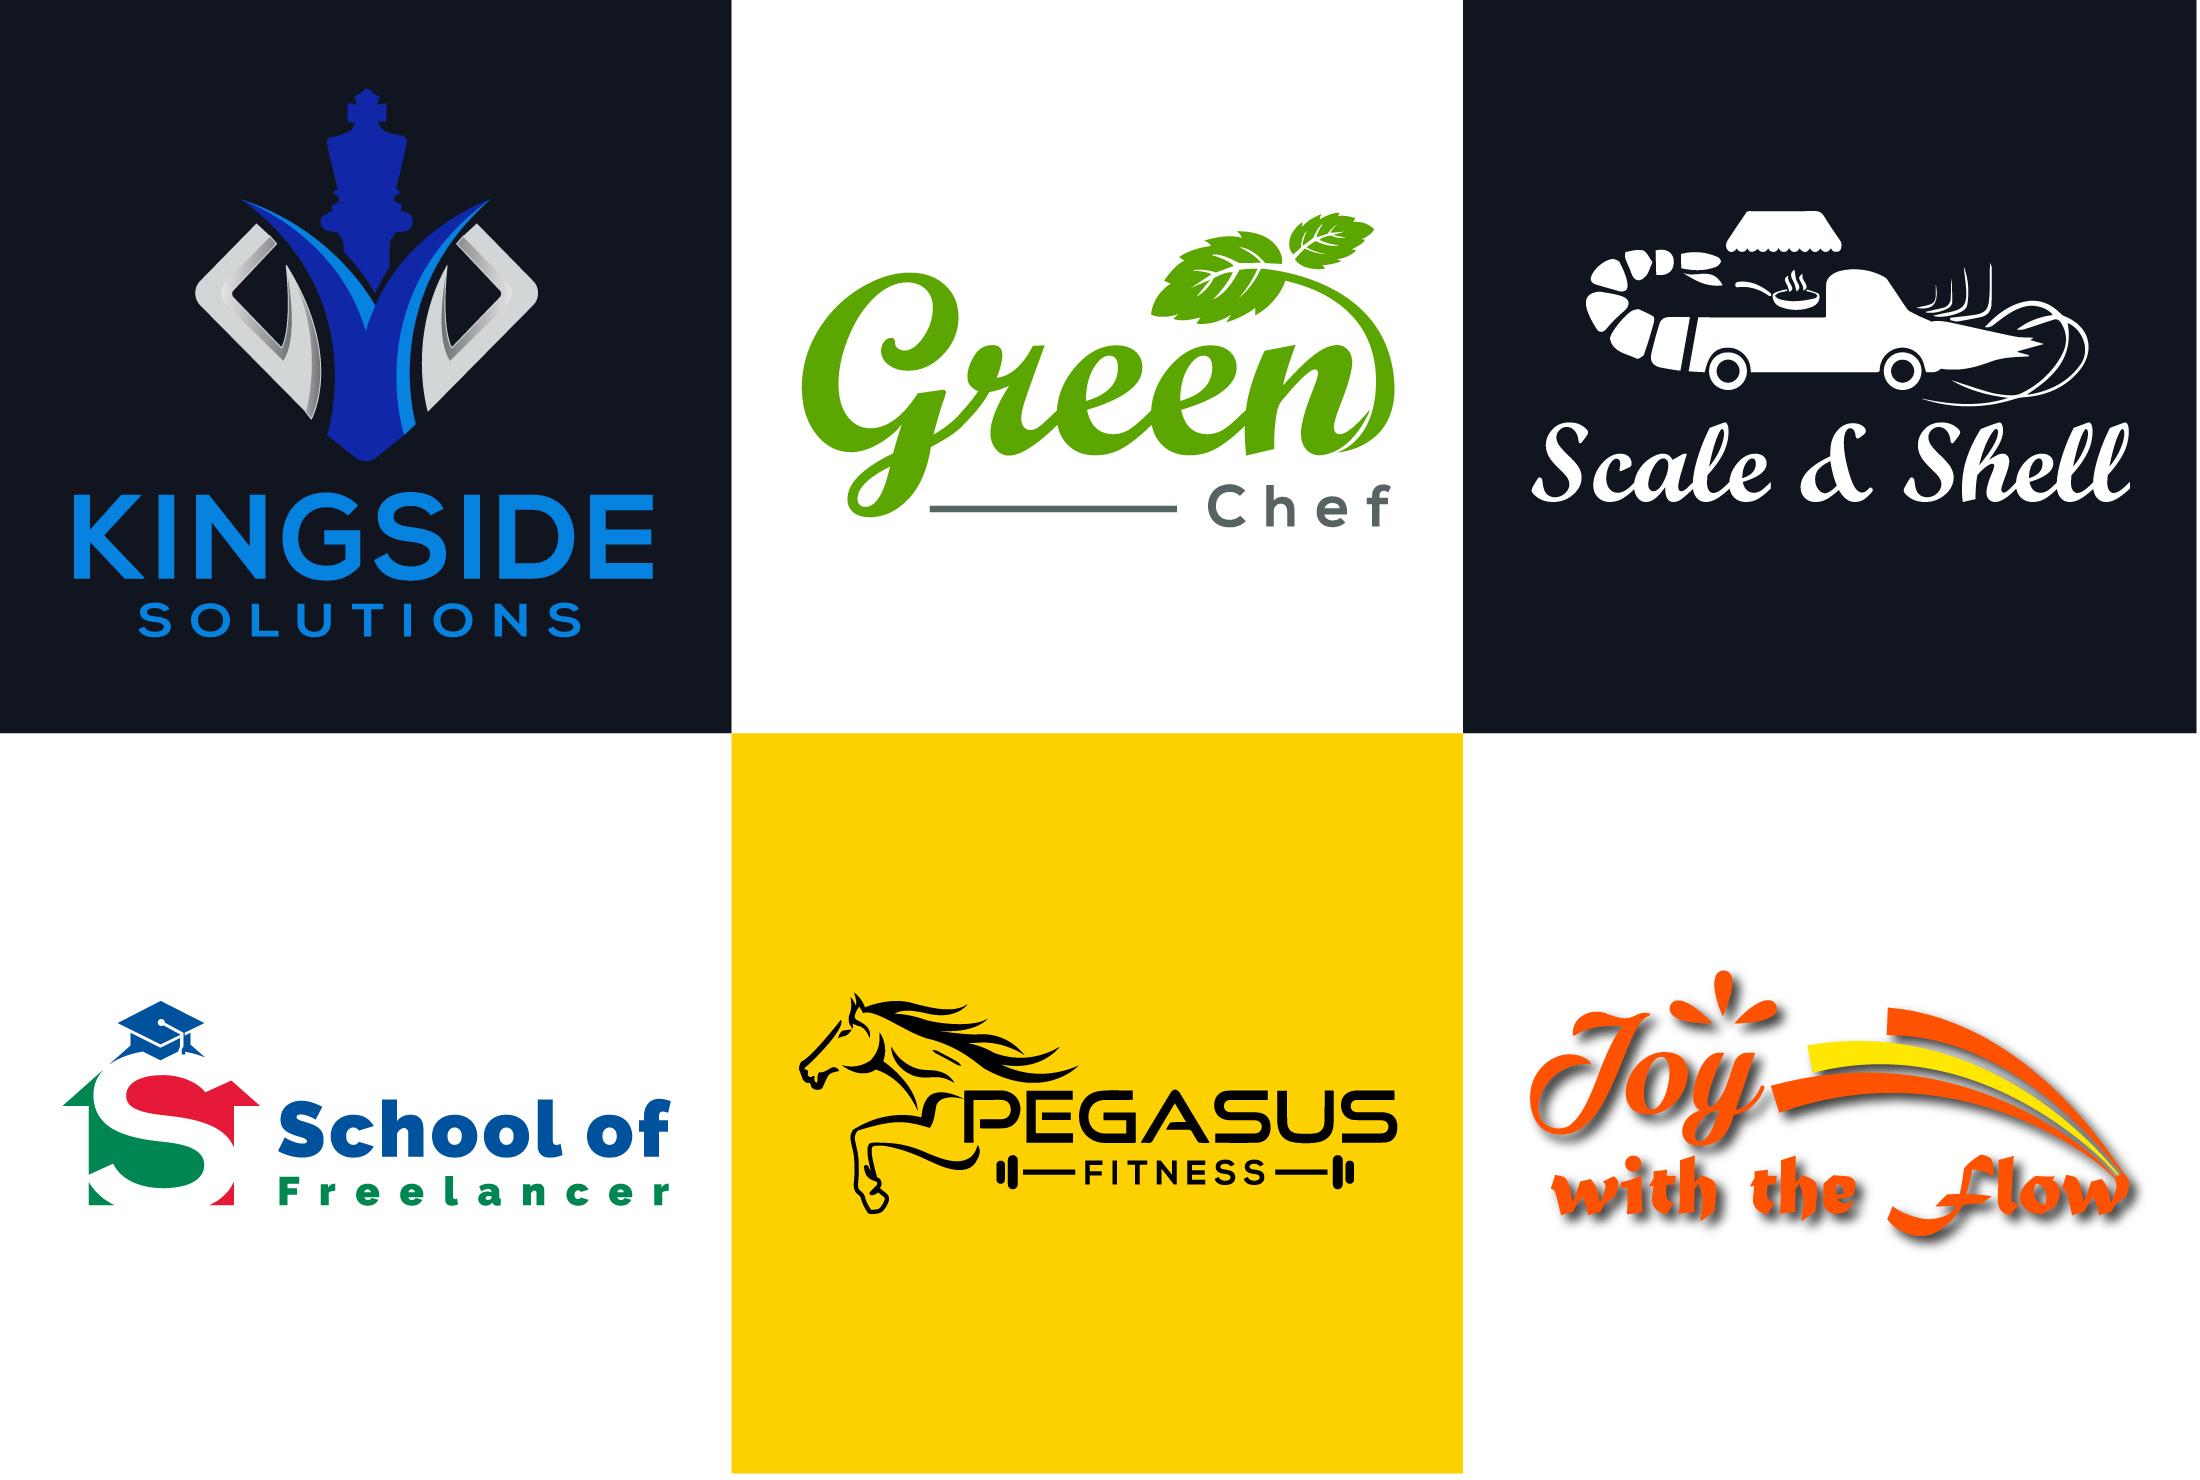 I Will Design Modern Creative Minimalist Flat & 3D Branding Logo